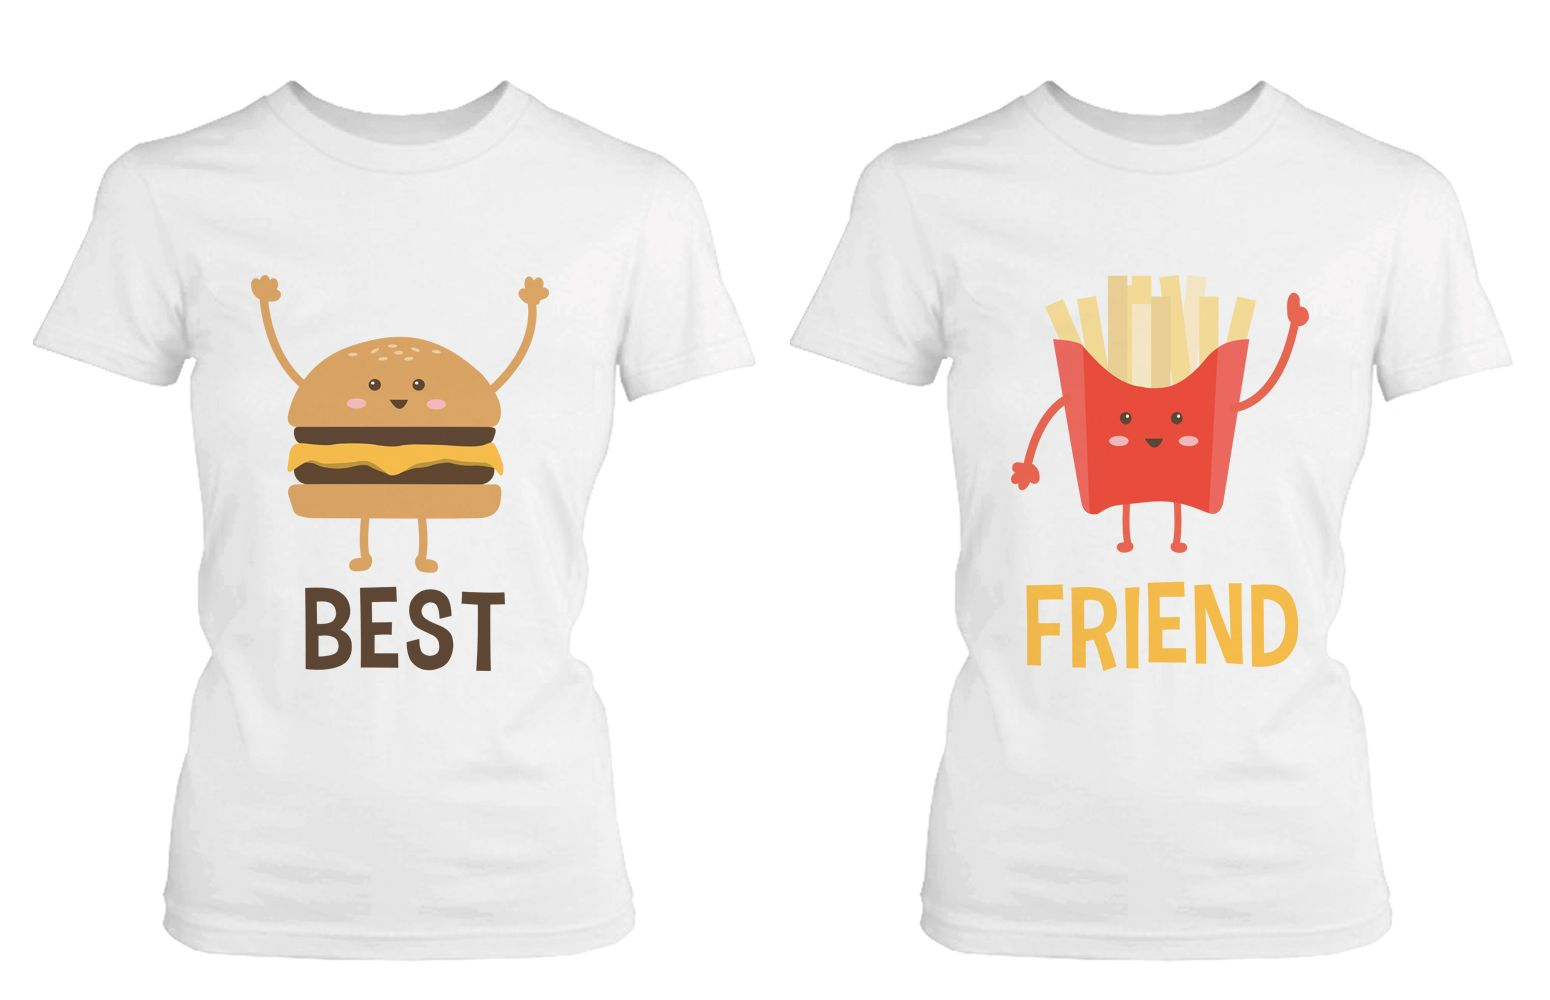 bestfriend tshirt ideas - google search | best friend<3 | pinterest